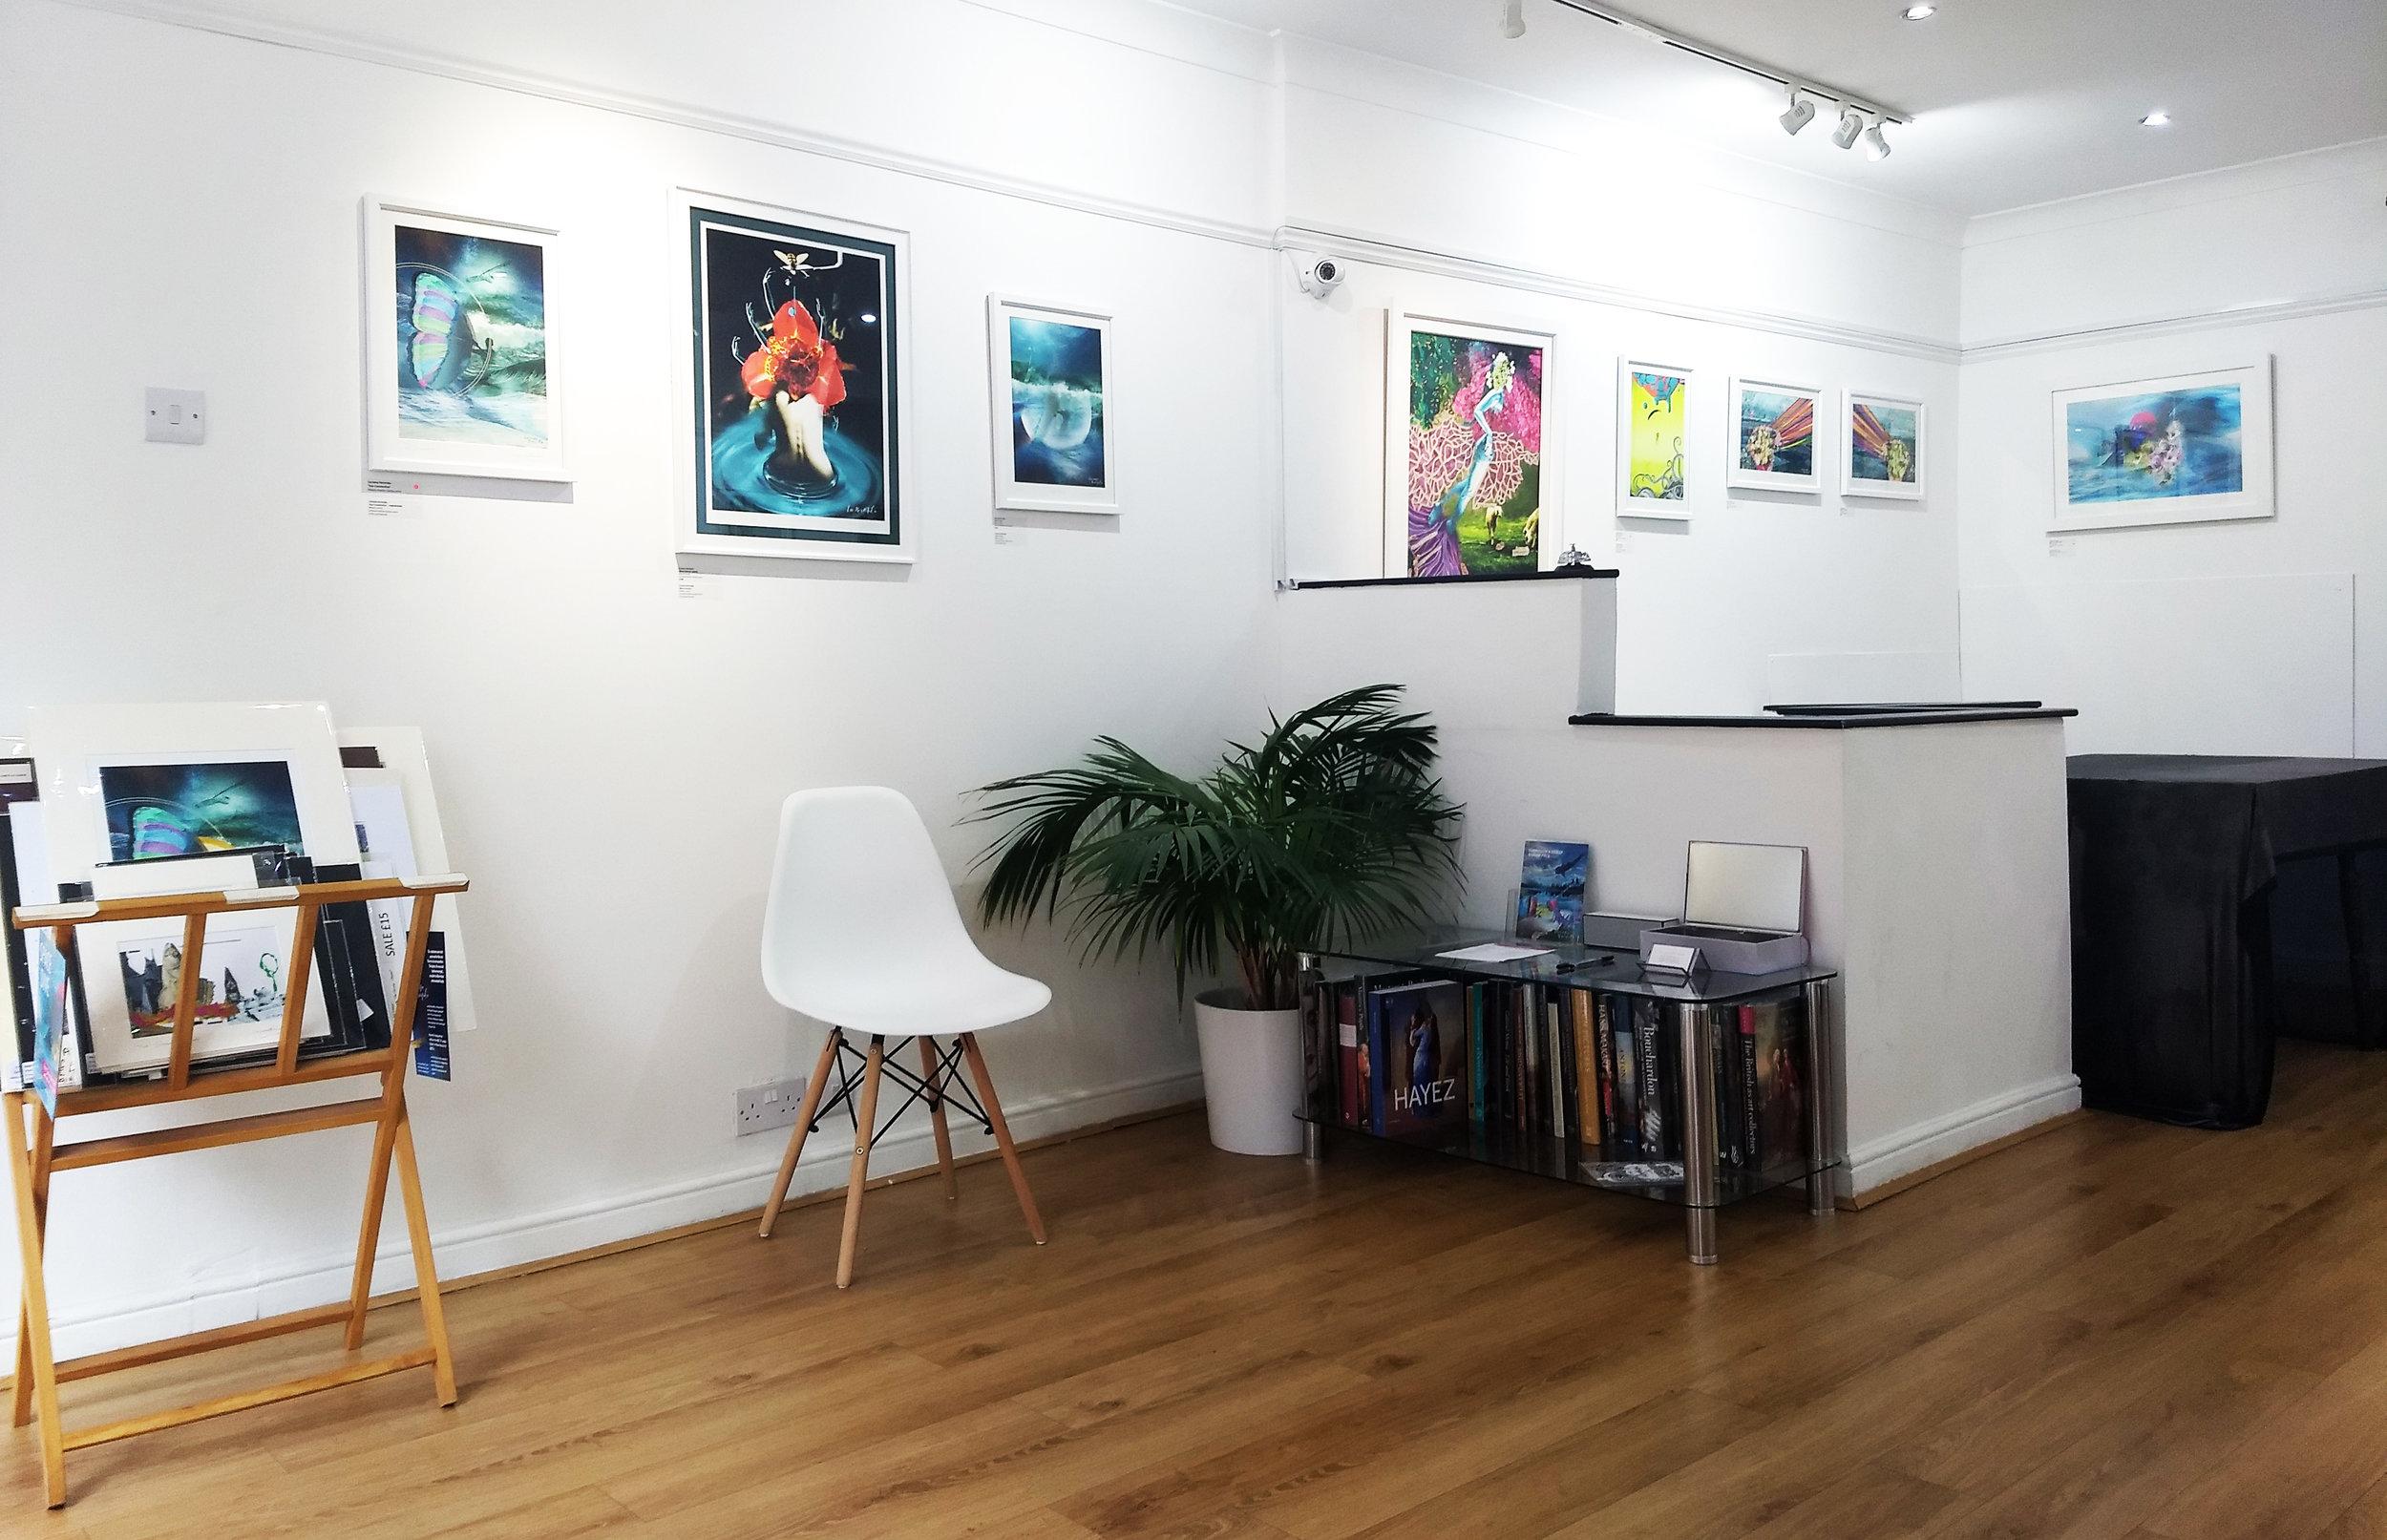 A WORLD OF IMAGINATION - Over 25 artworks on display